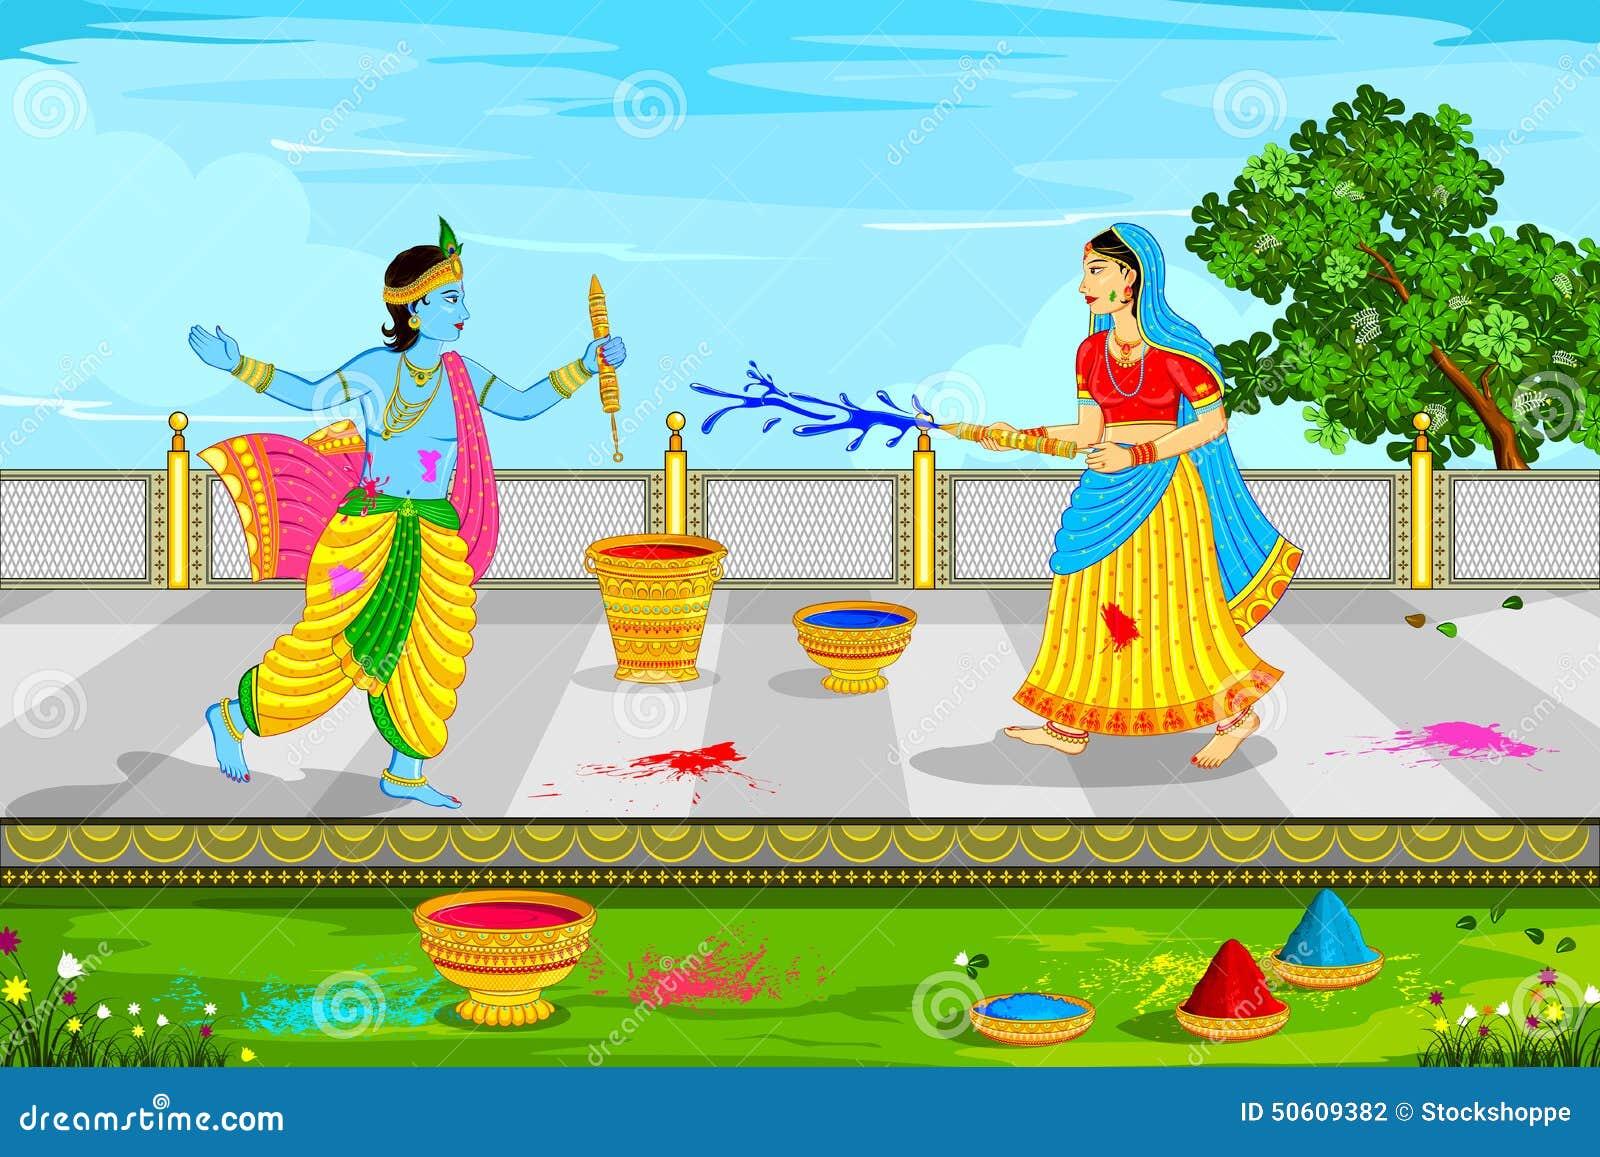 Happy holi radha krishna images - Radha Krishna Playing Holi Stock Photography